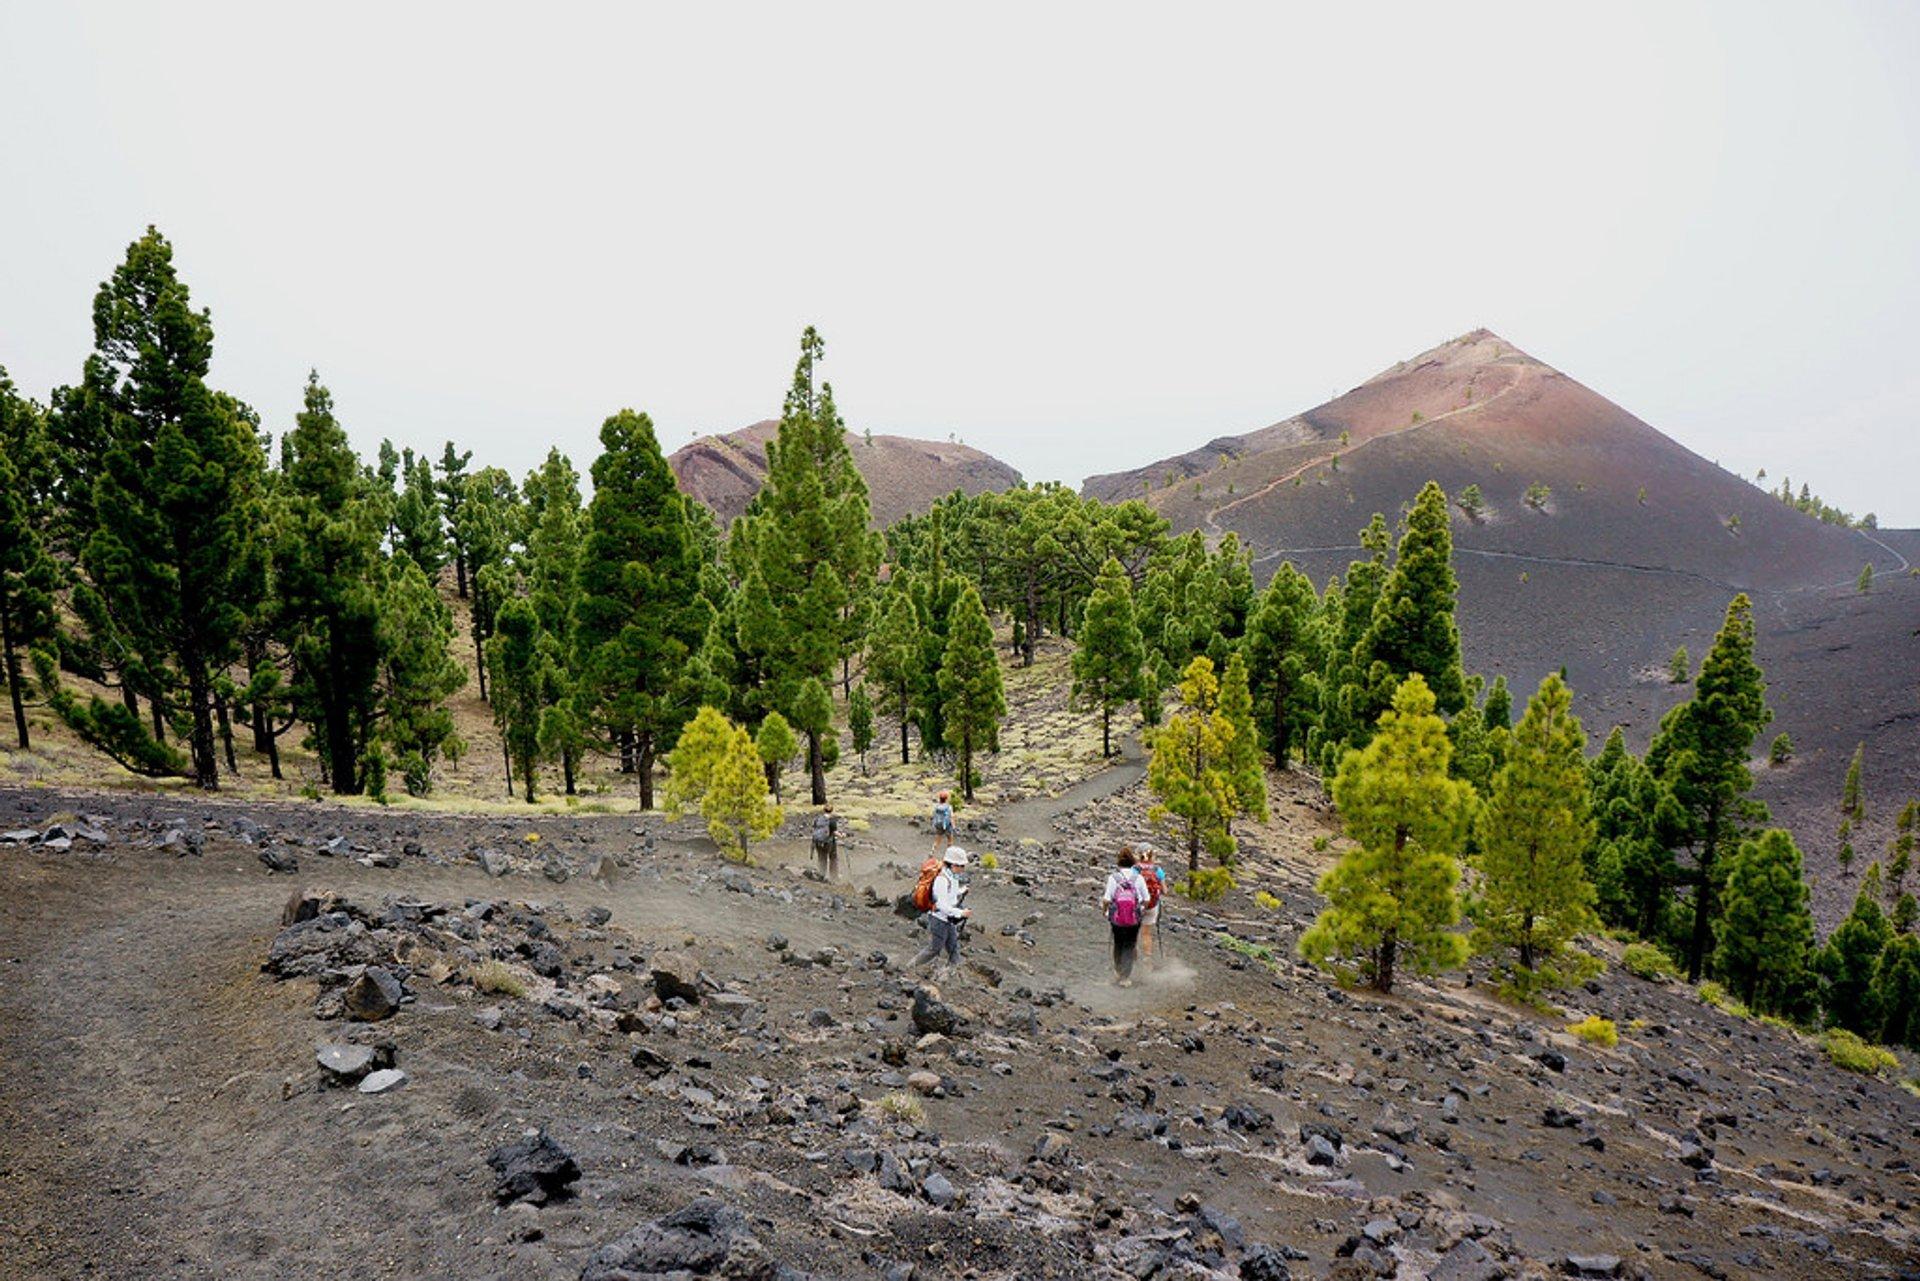 La Palma Trekking – Ruta de los Volcanes 2020